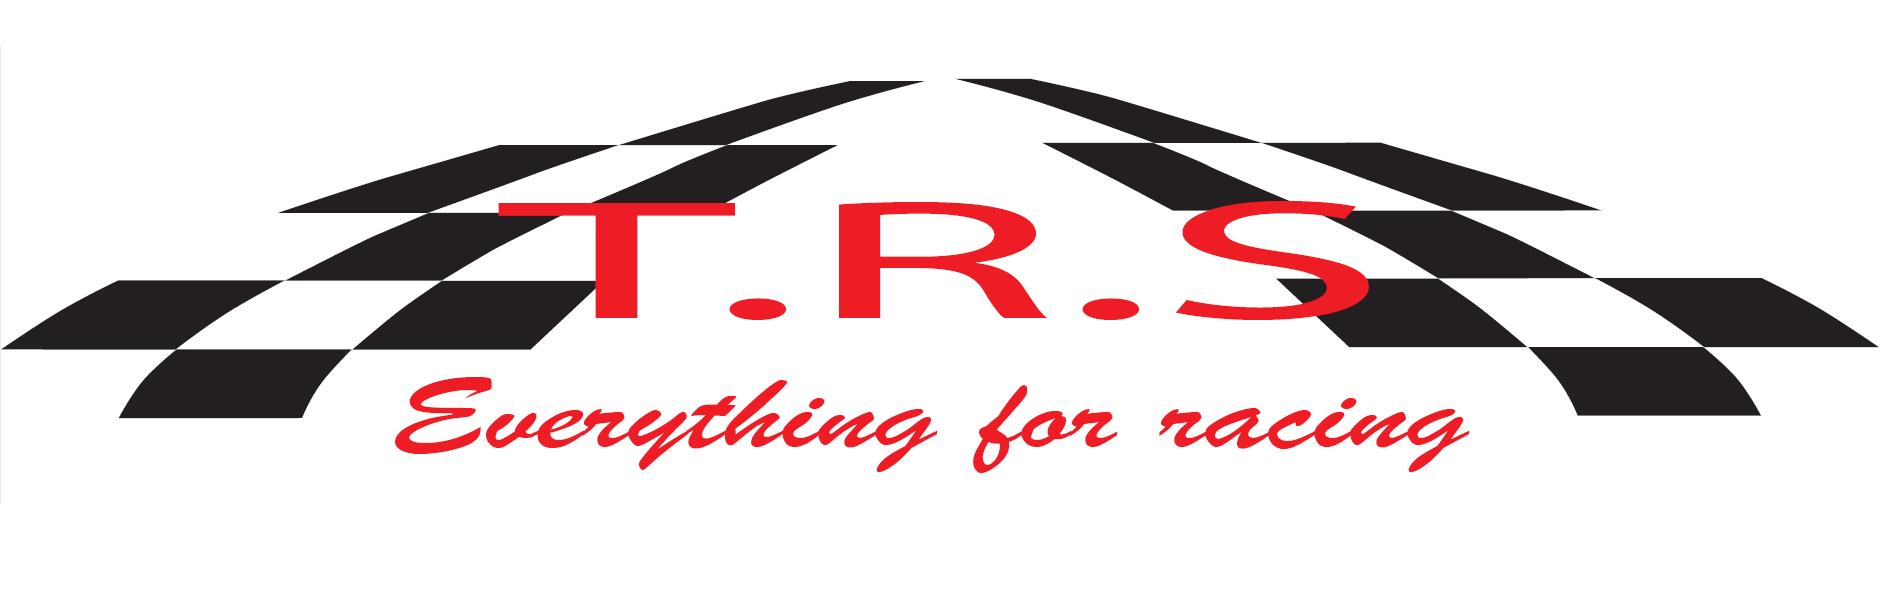 Tech Race Service